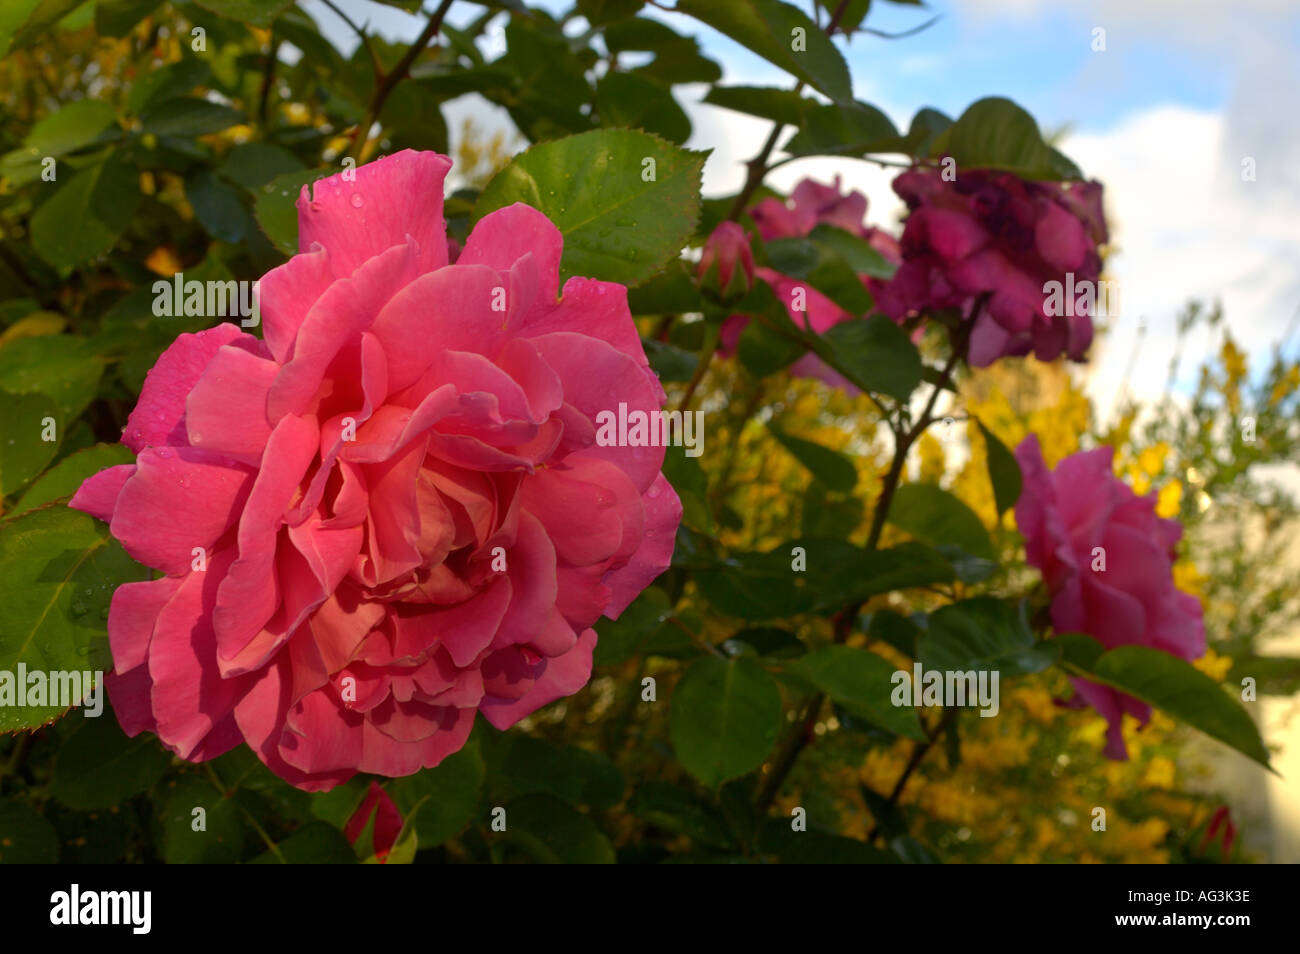 Pink Red Rose Bush Blossom Flower Bloom In Spring Garden